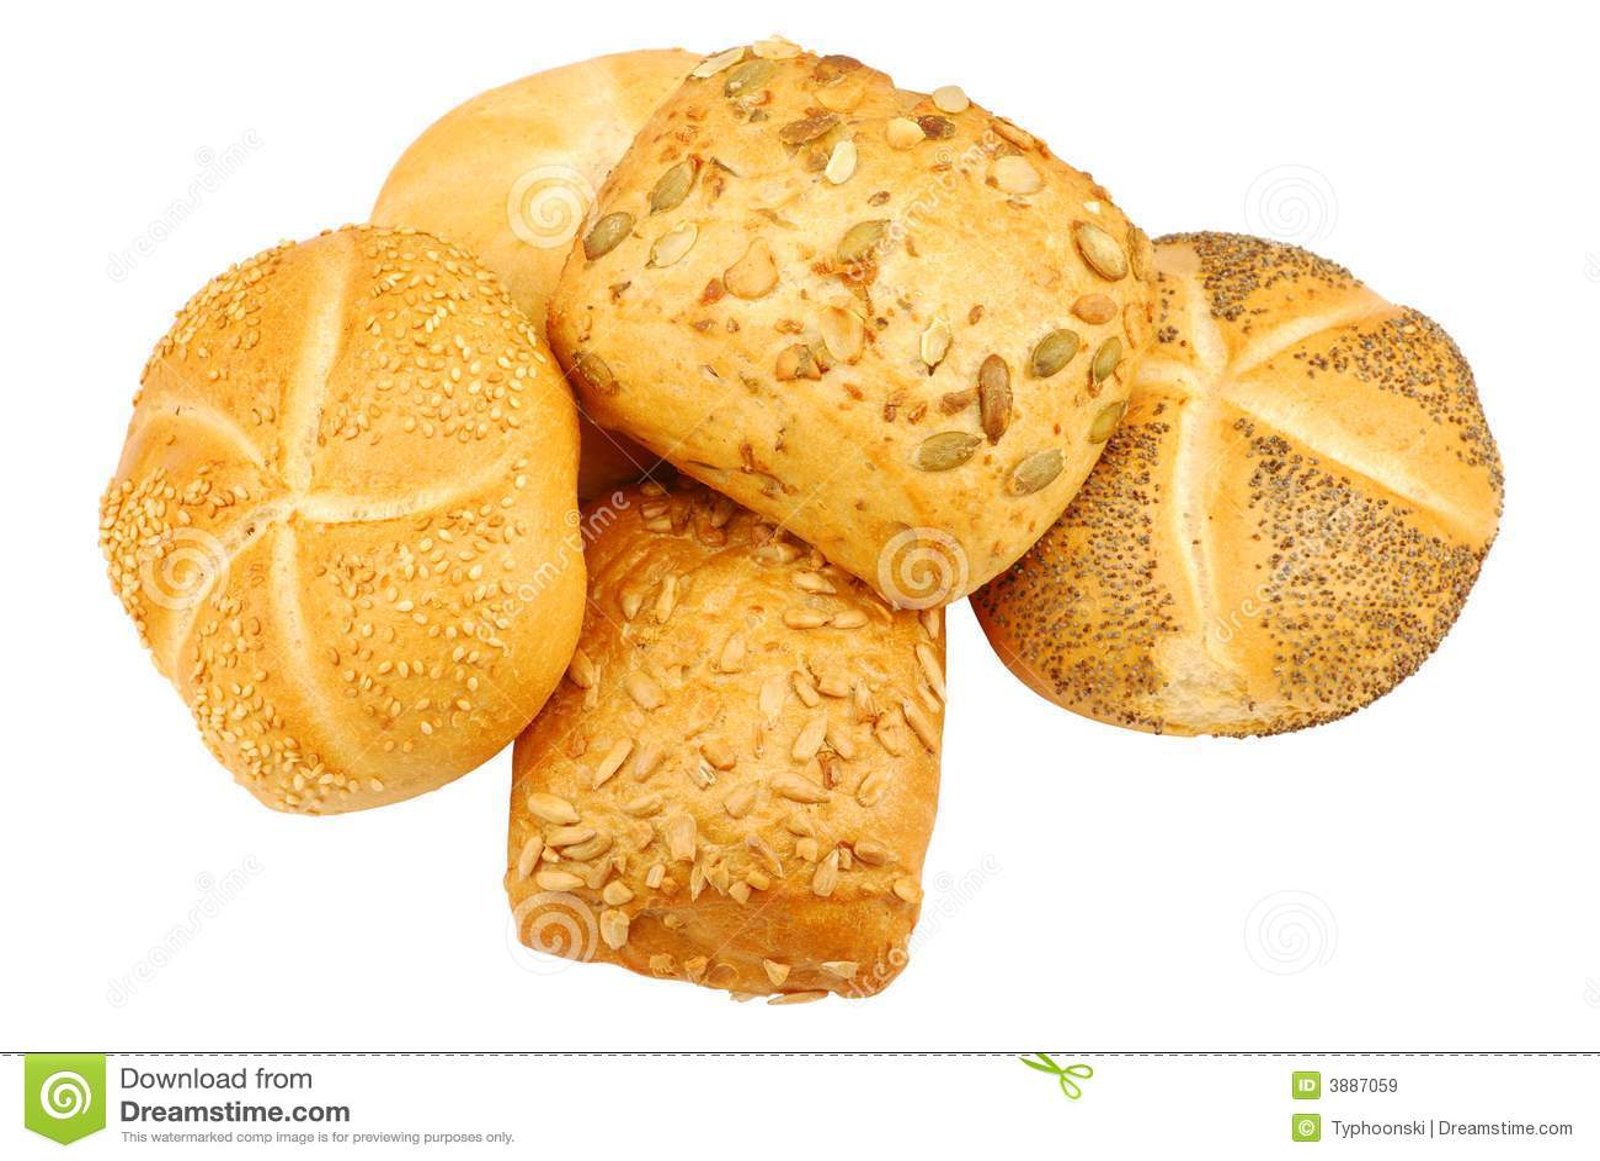 Rulli di pane fresco